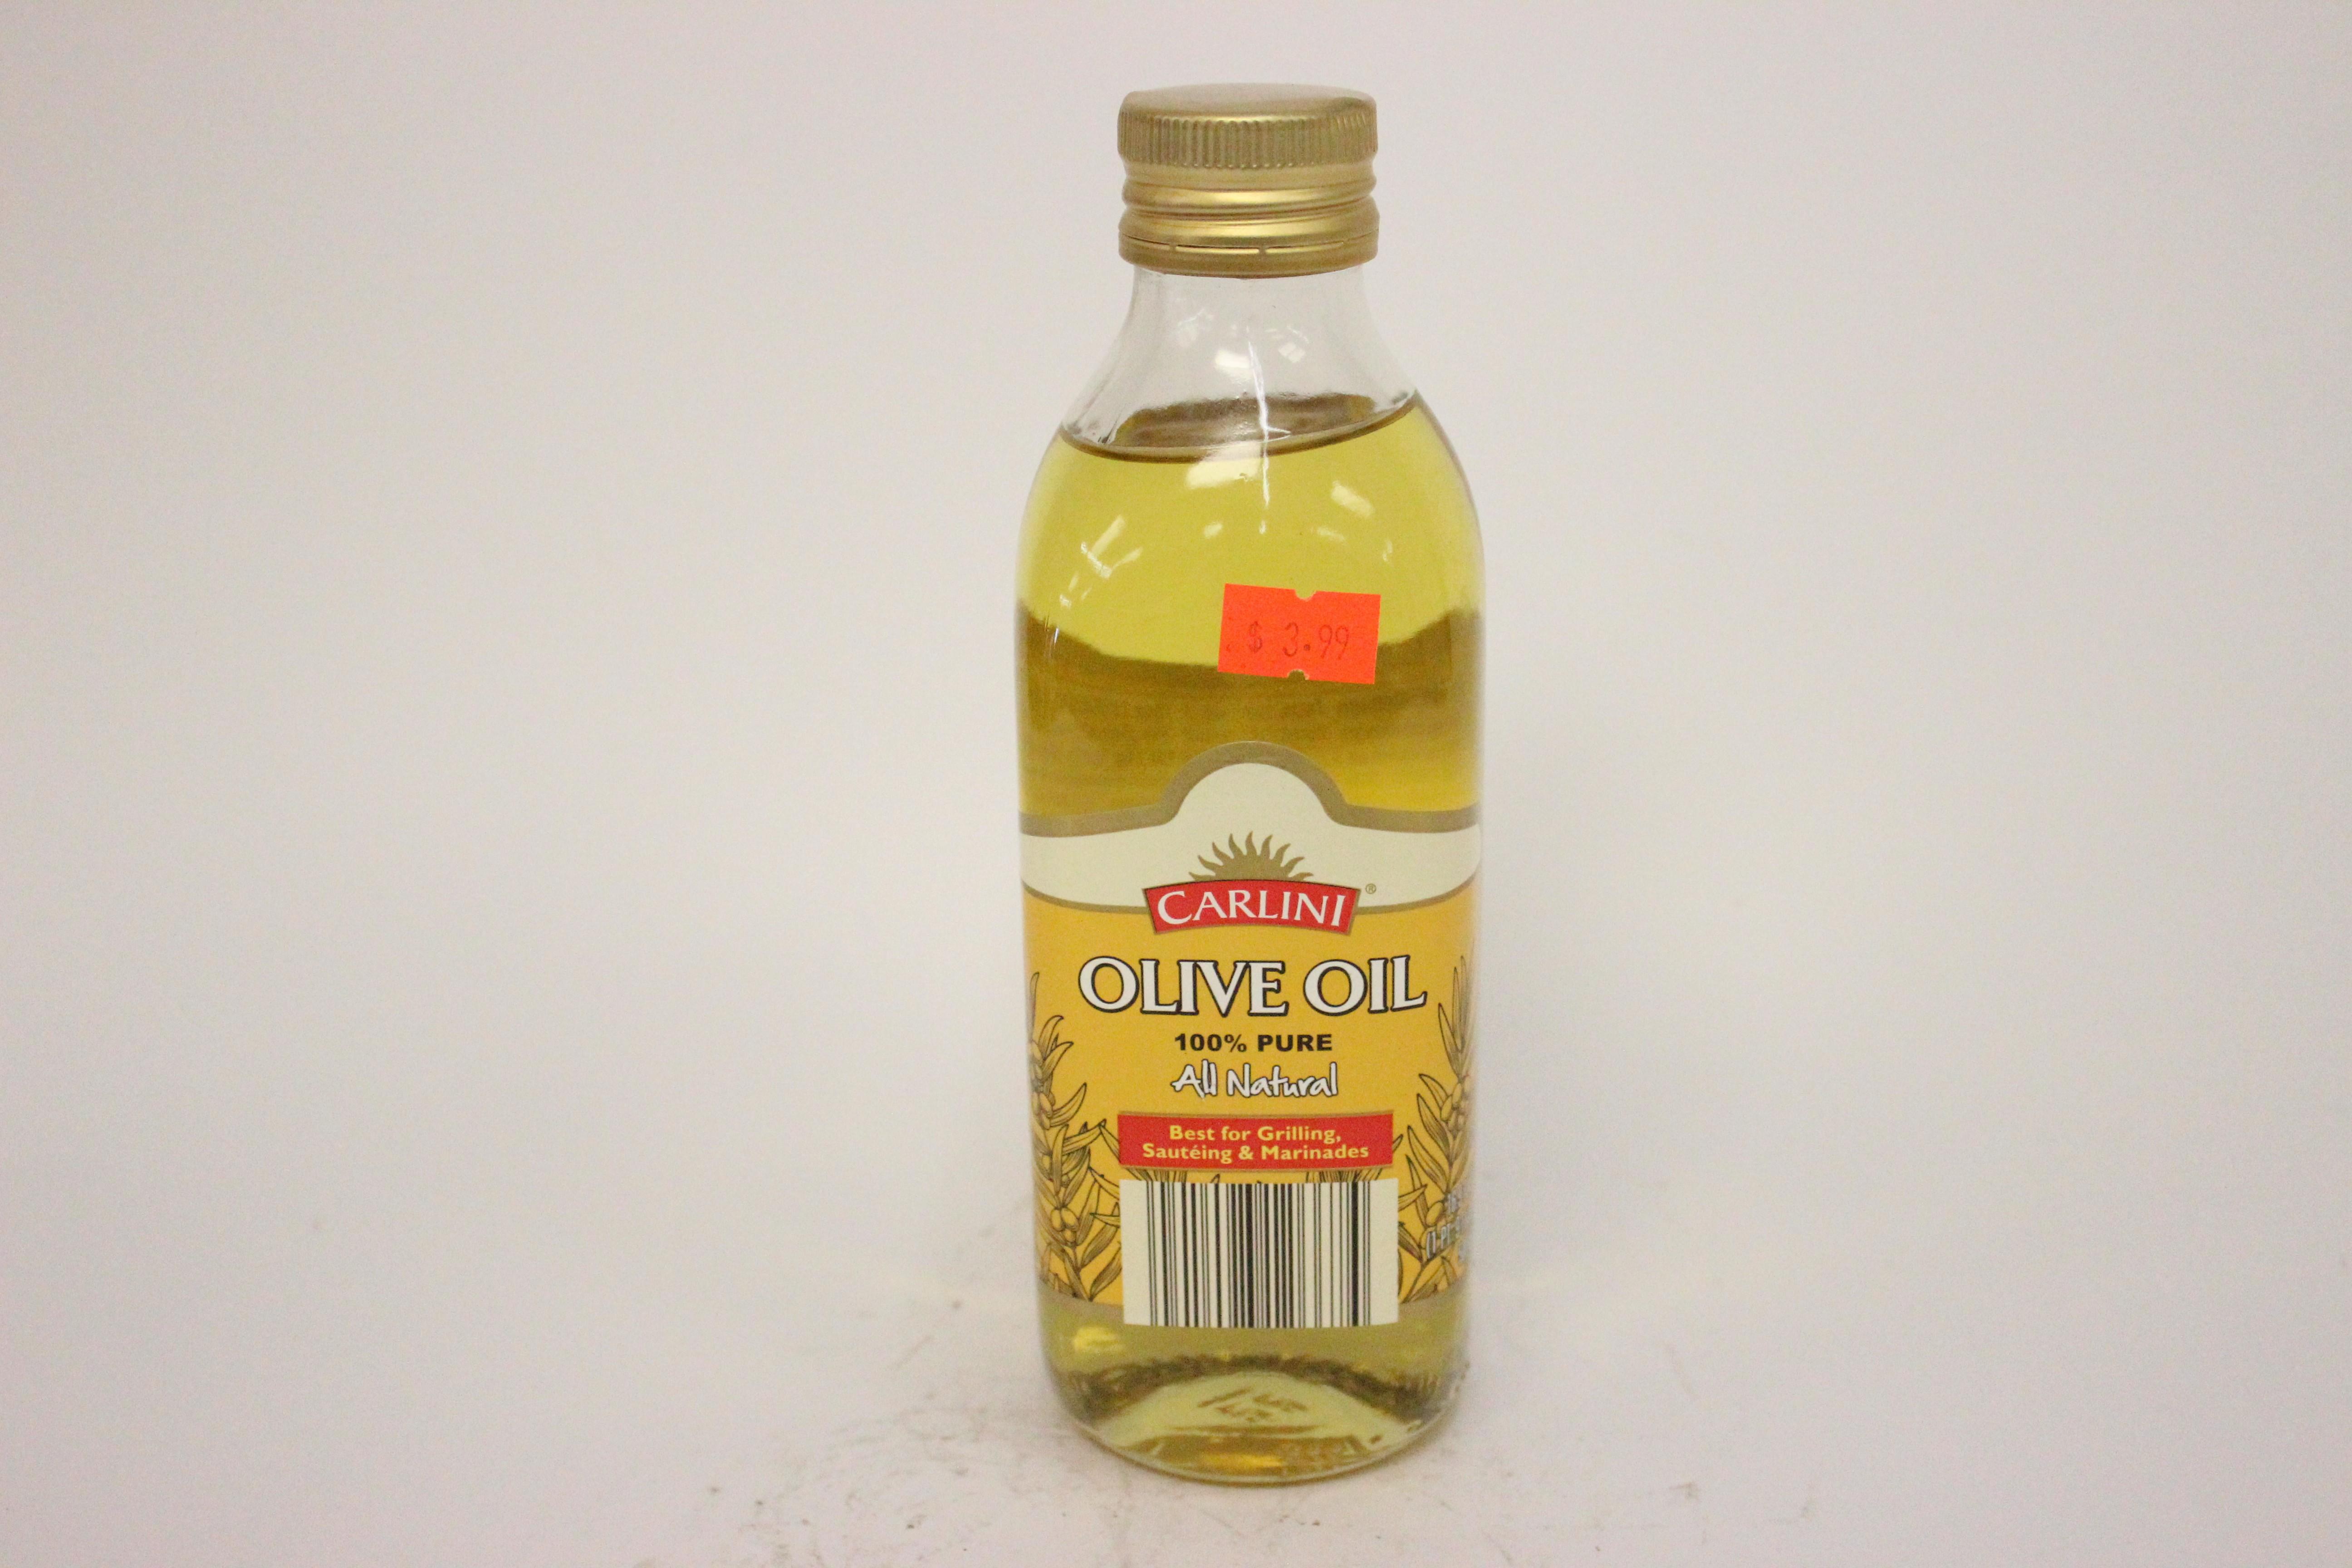 Carlini Olive Oil All Natural 16.9 oz